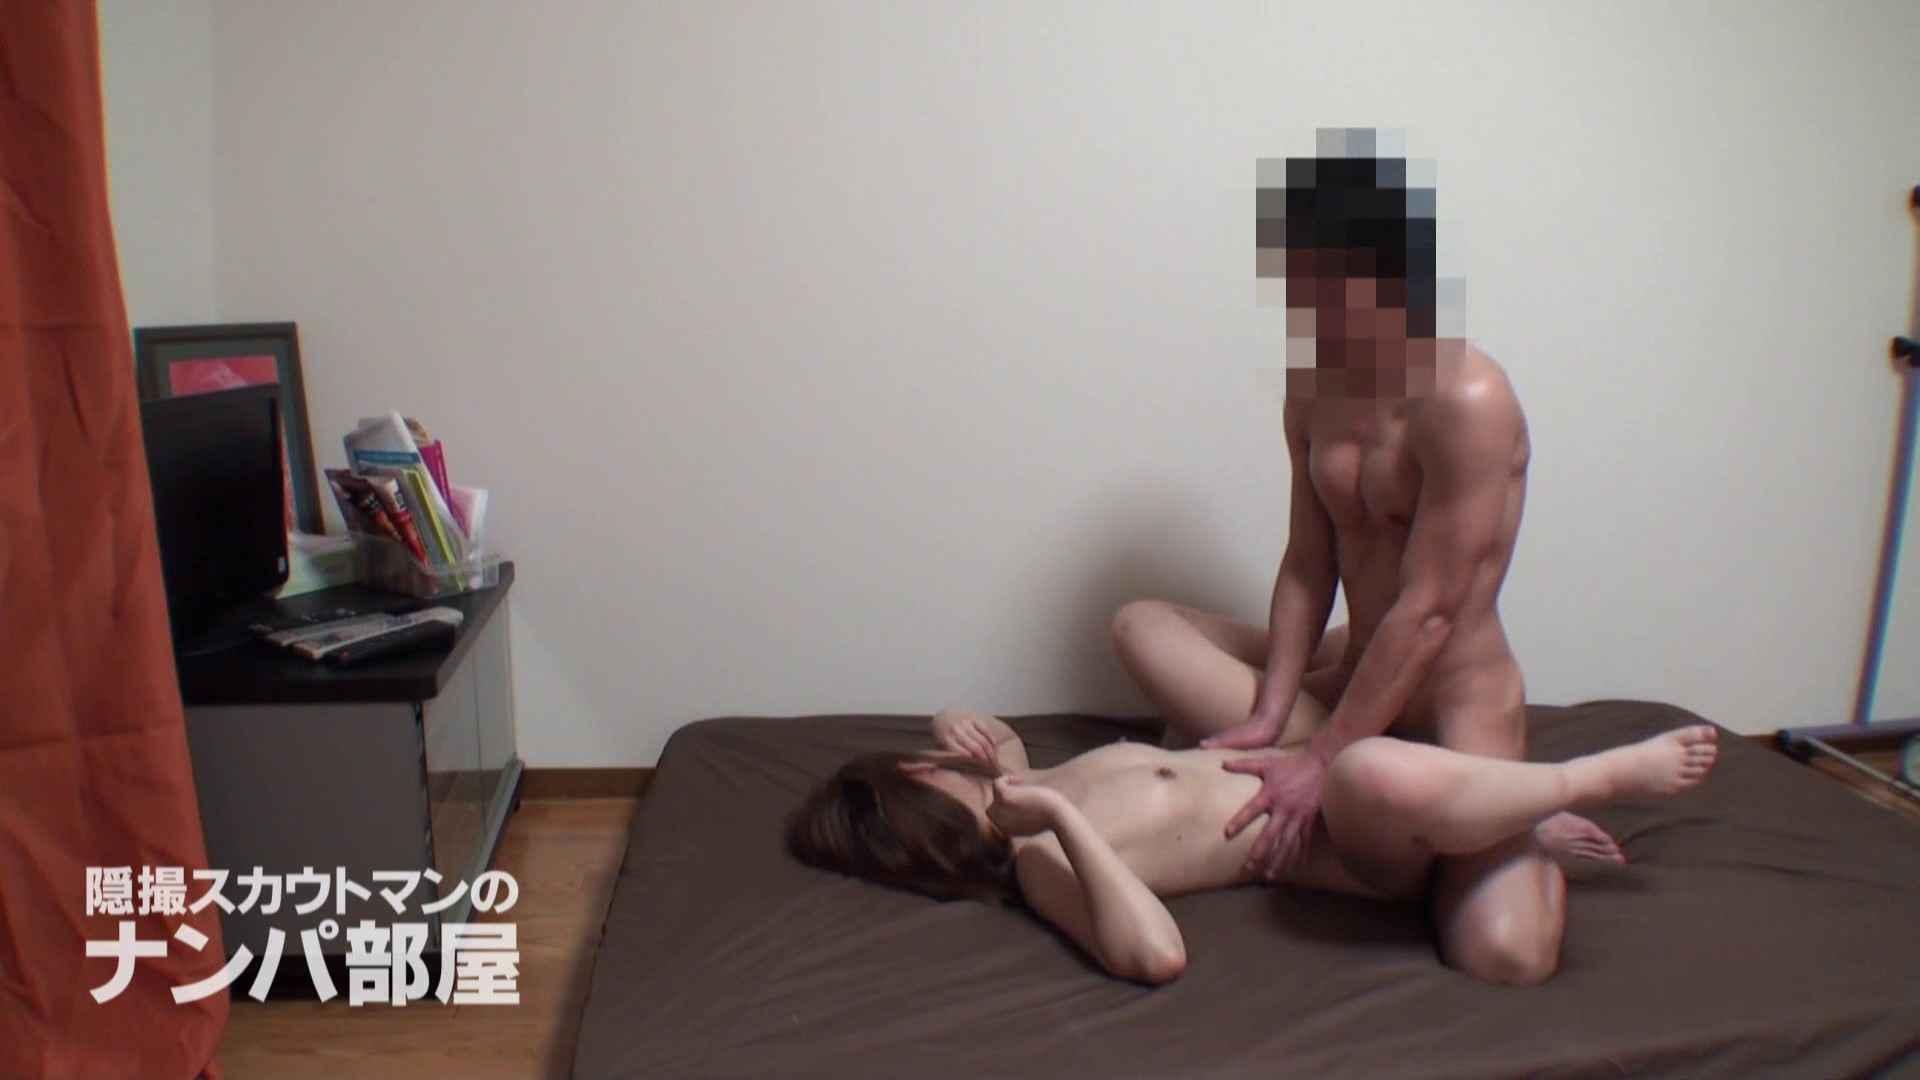 vol.2 kana 脱衣所・着替え編 | ナンパ  65pic 4